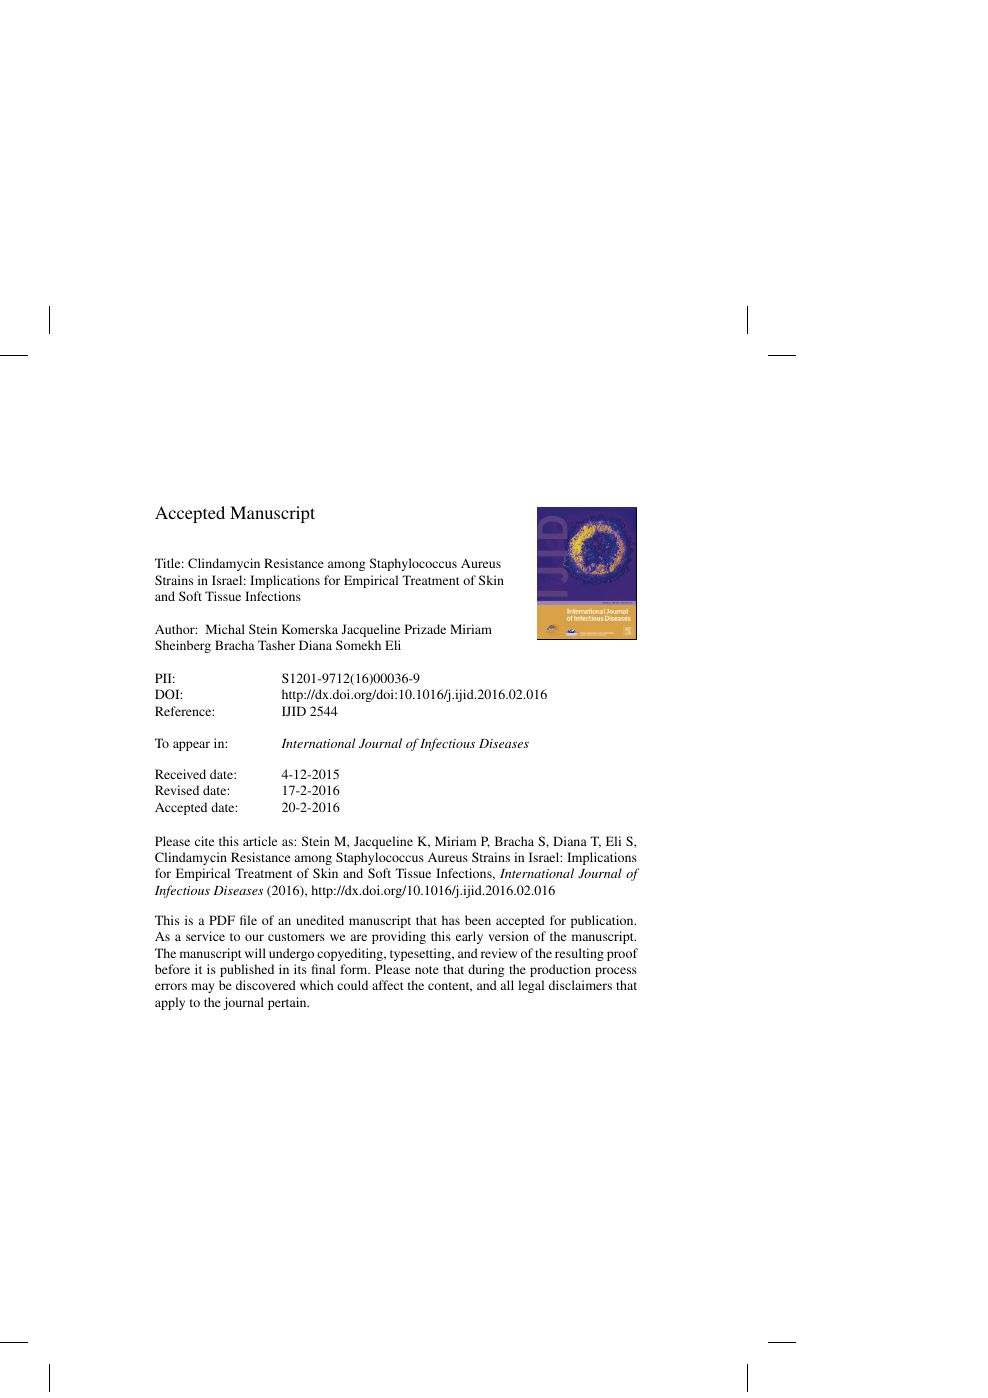 Clindamycin Resistance among Staphylococcus Aureus Strains in Israel